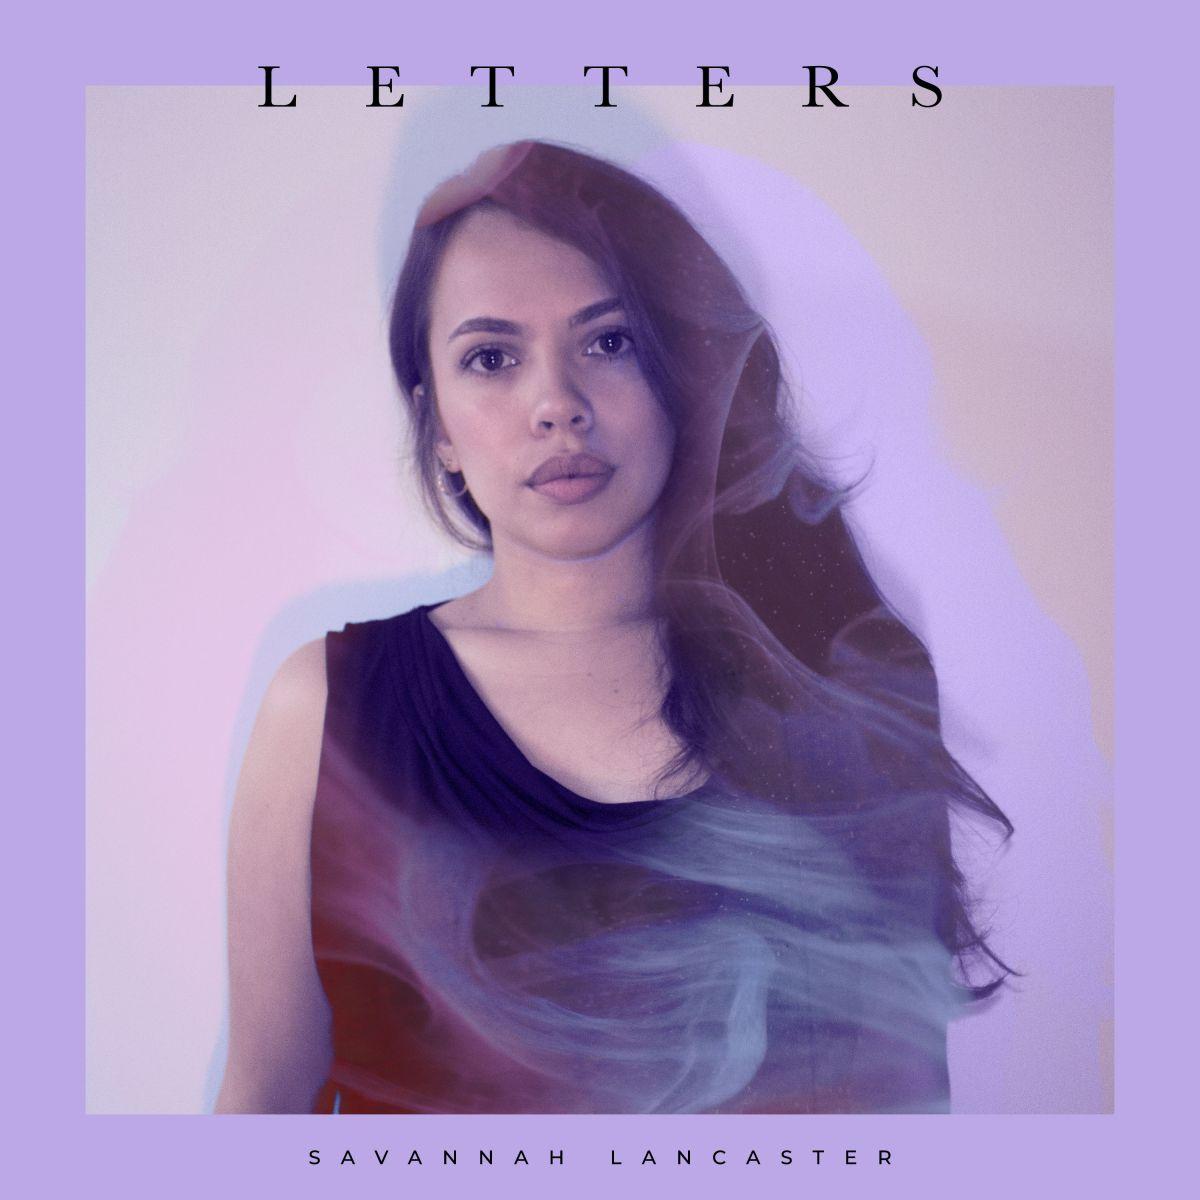 Savannah Lancaster releases Letters, her debut album